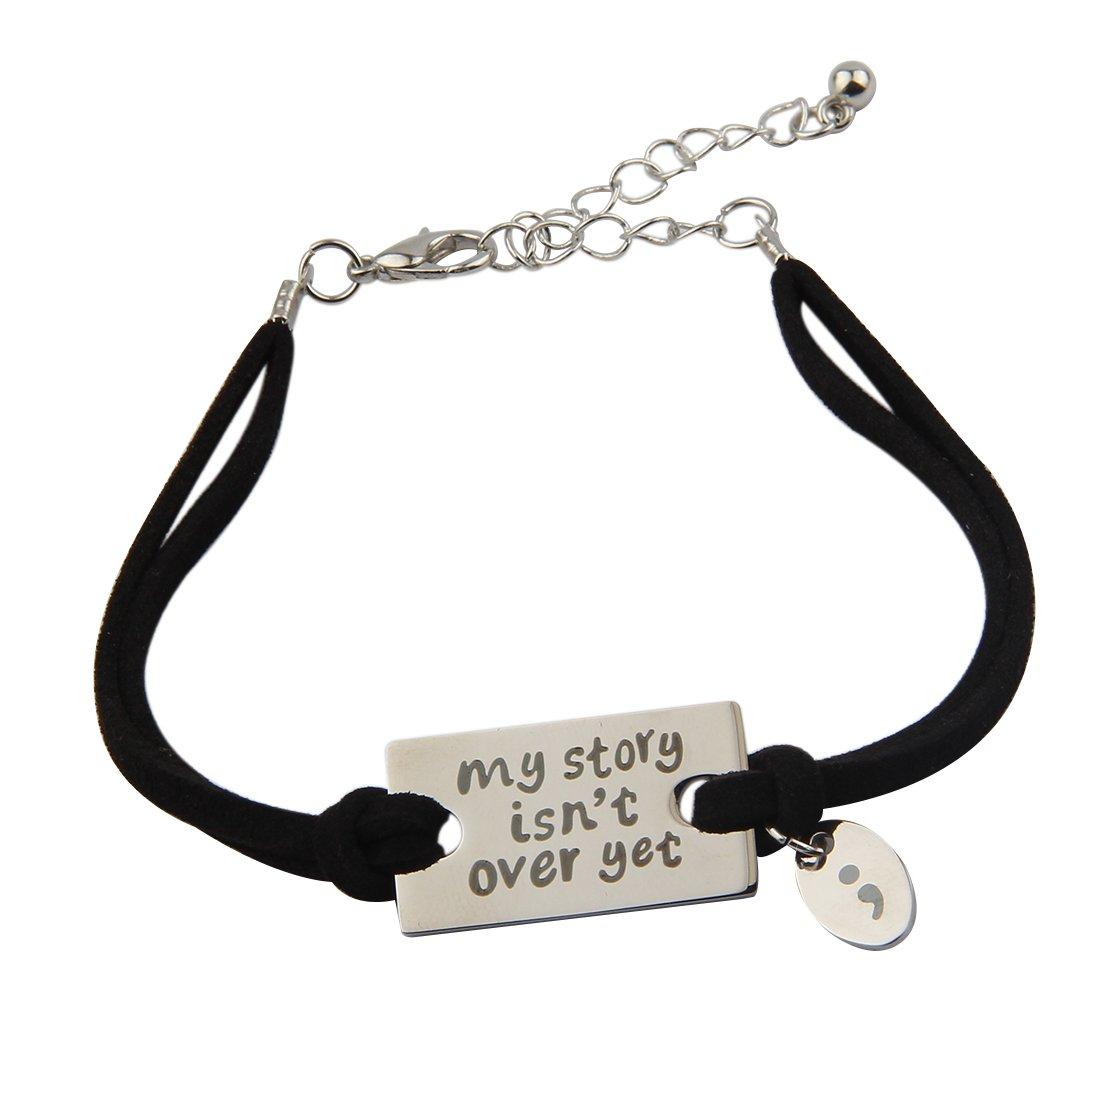 ZUOBAO My Story Isn't Over Yet Mental Health Awareness Wrap Bracelet (Silver B+black)